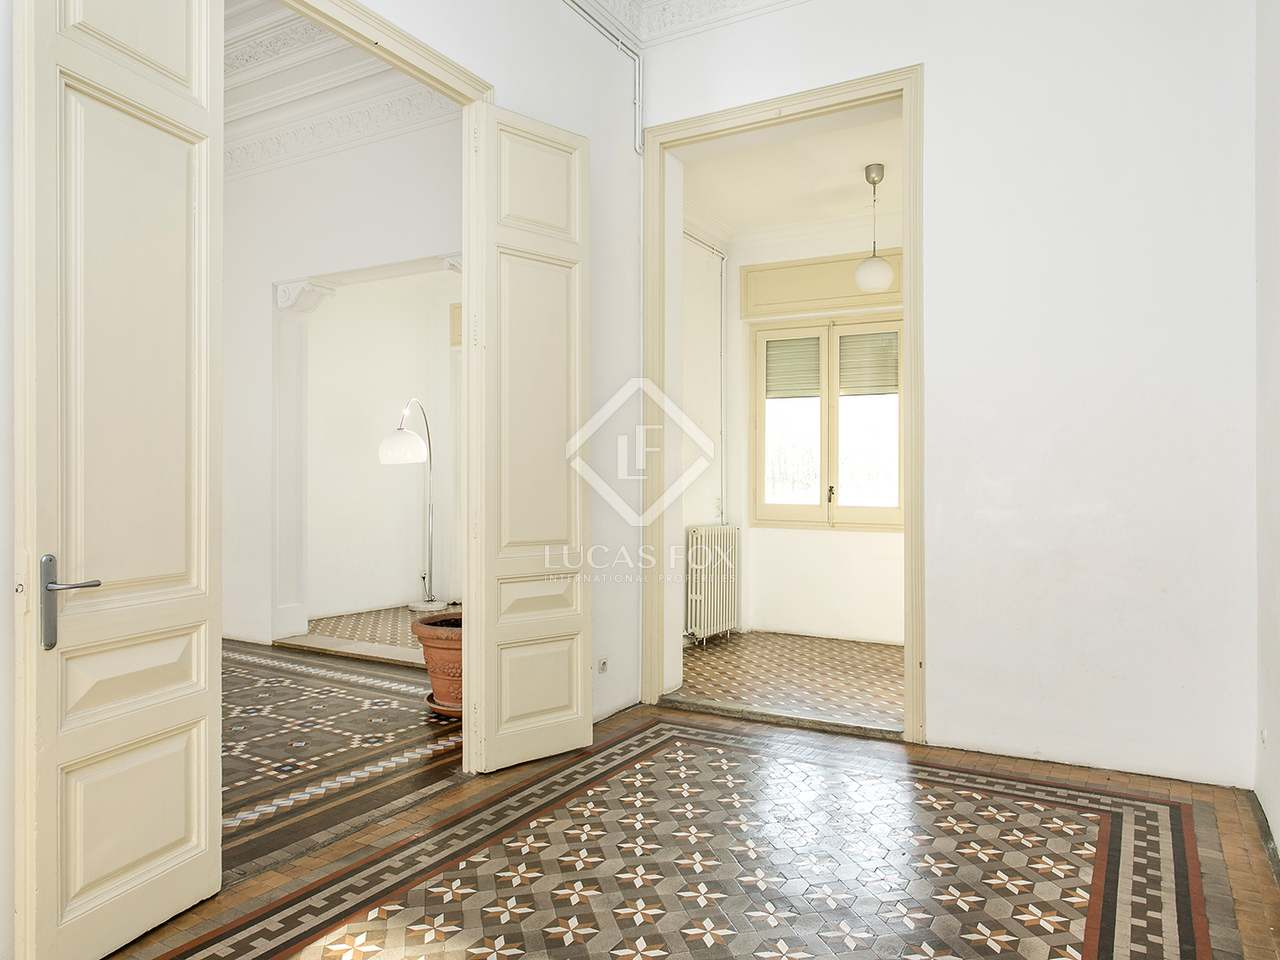 Apartamento de 280 m en alquiler en barcelona - Calle princesa barcelona ...